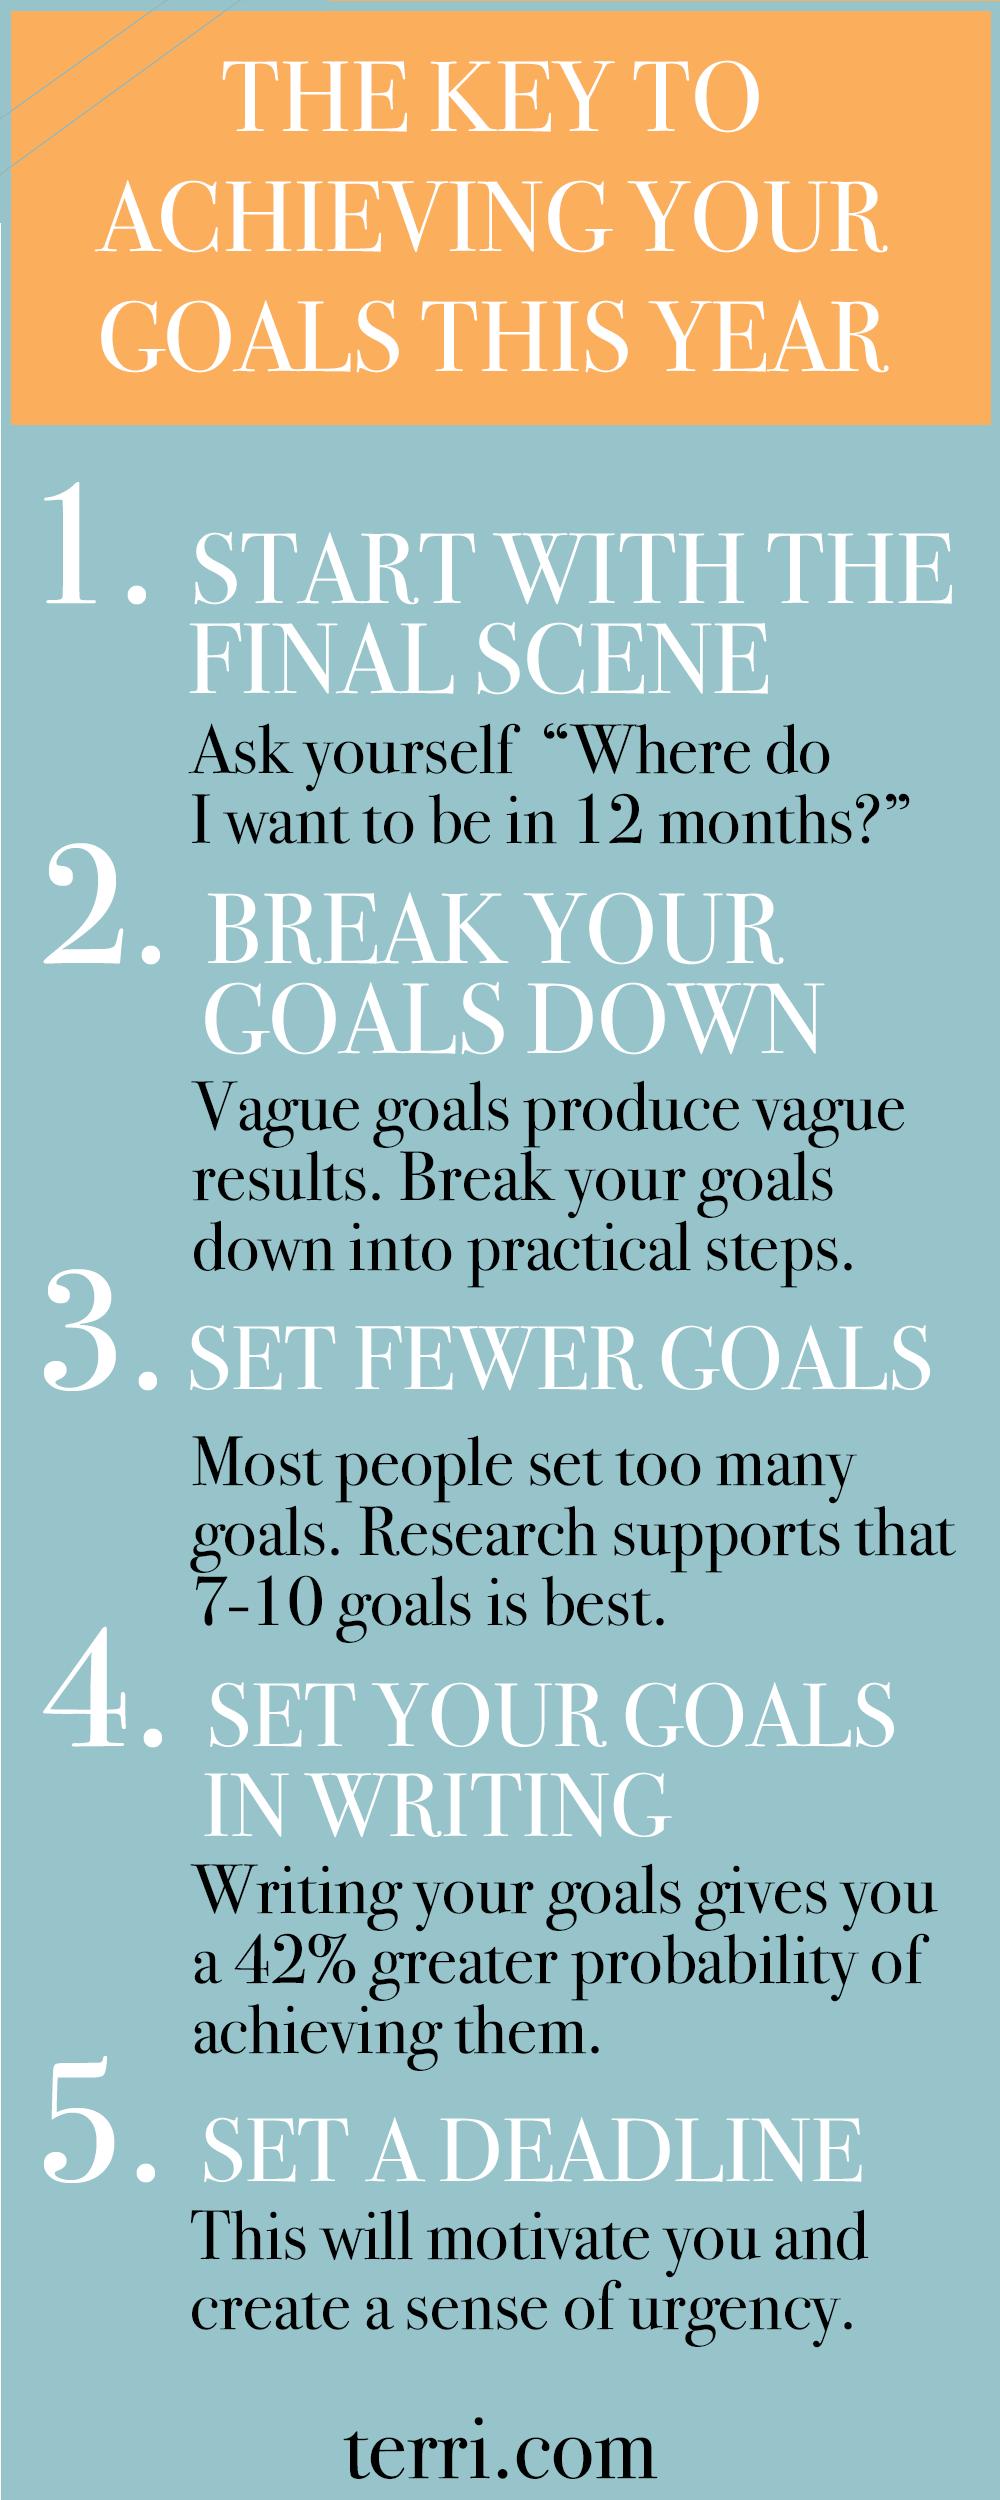 Goal-Setting Guide - Terri Savelle Foy Ministries   www.terri.com